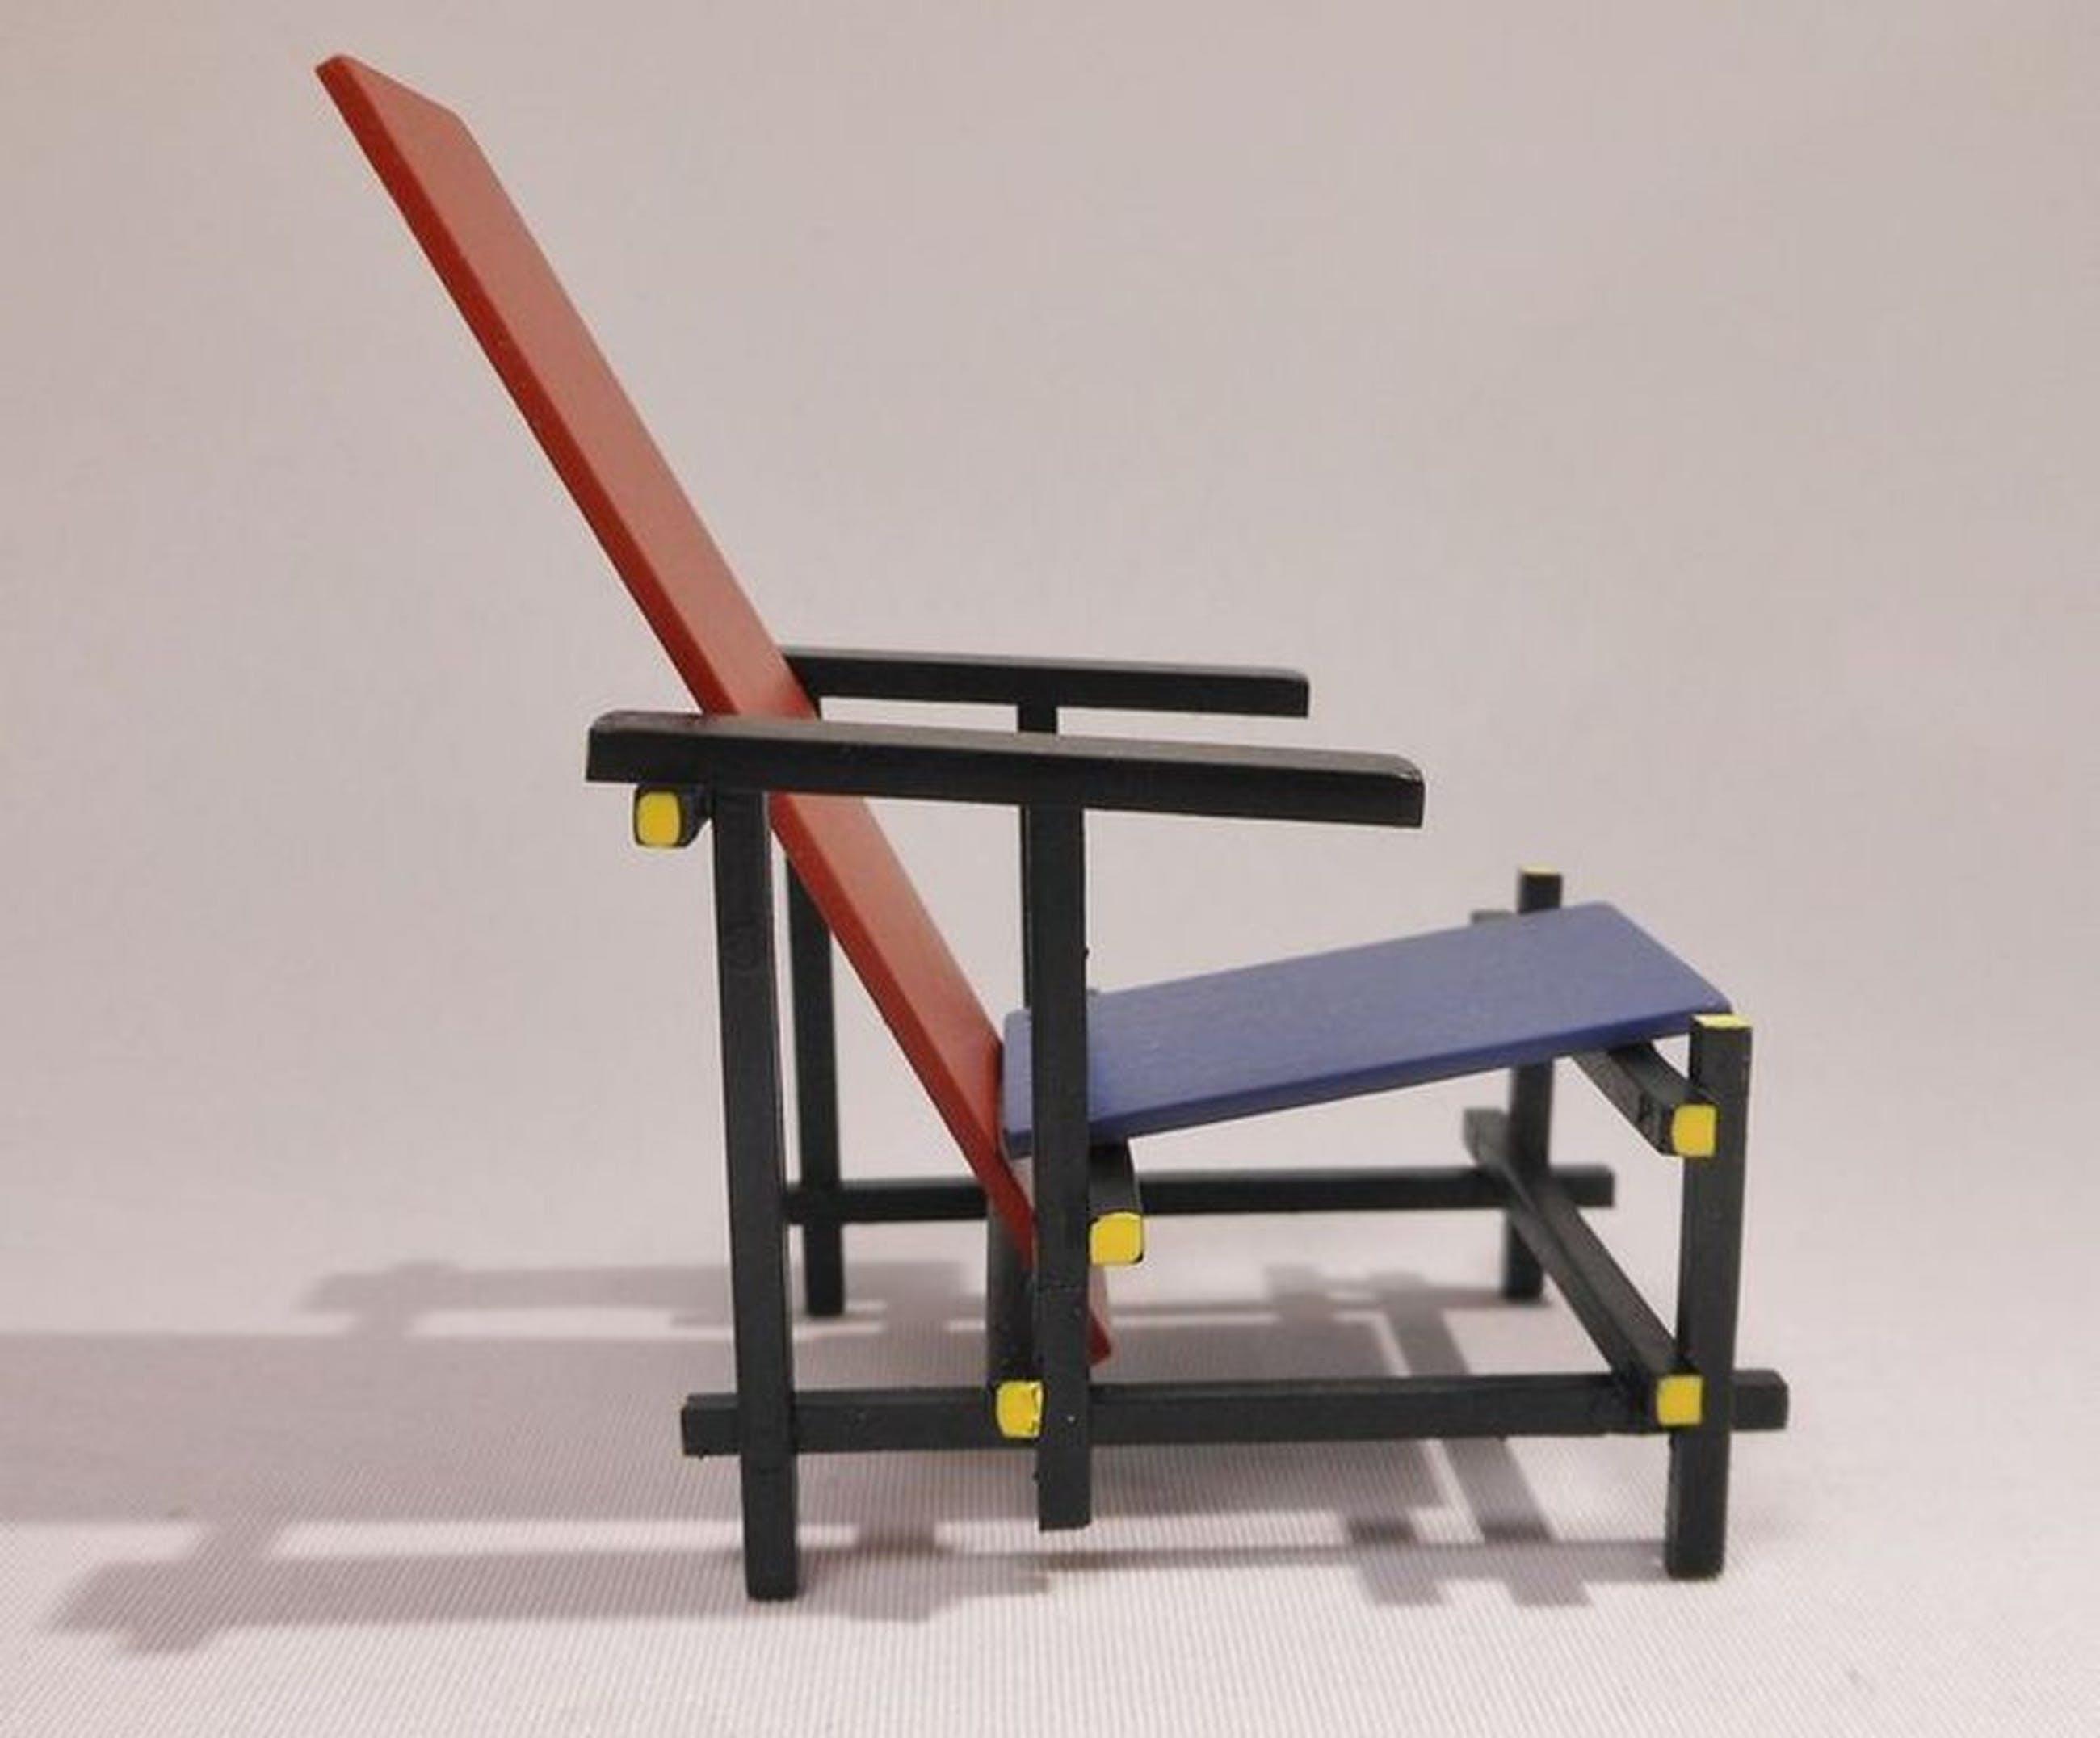 Stoel Gerrit Rietveld : Gerrit rietveld miniatuur rood blauwe stoel rietveldstoel